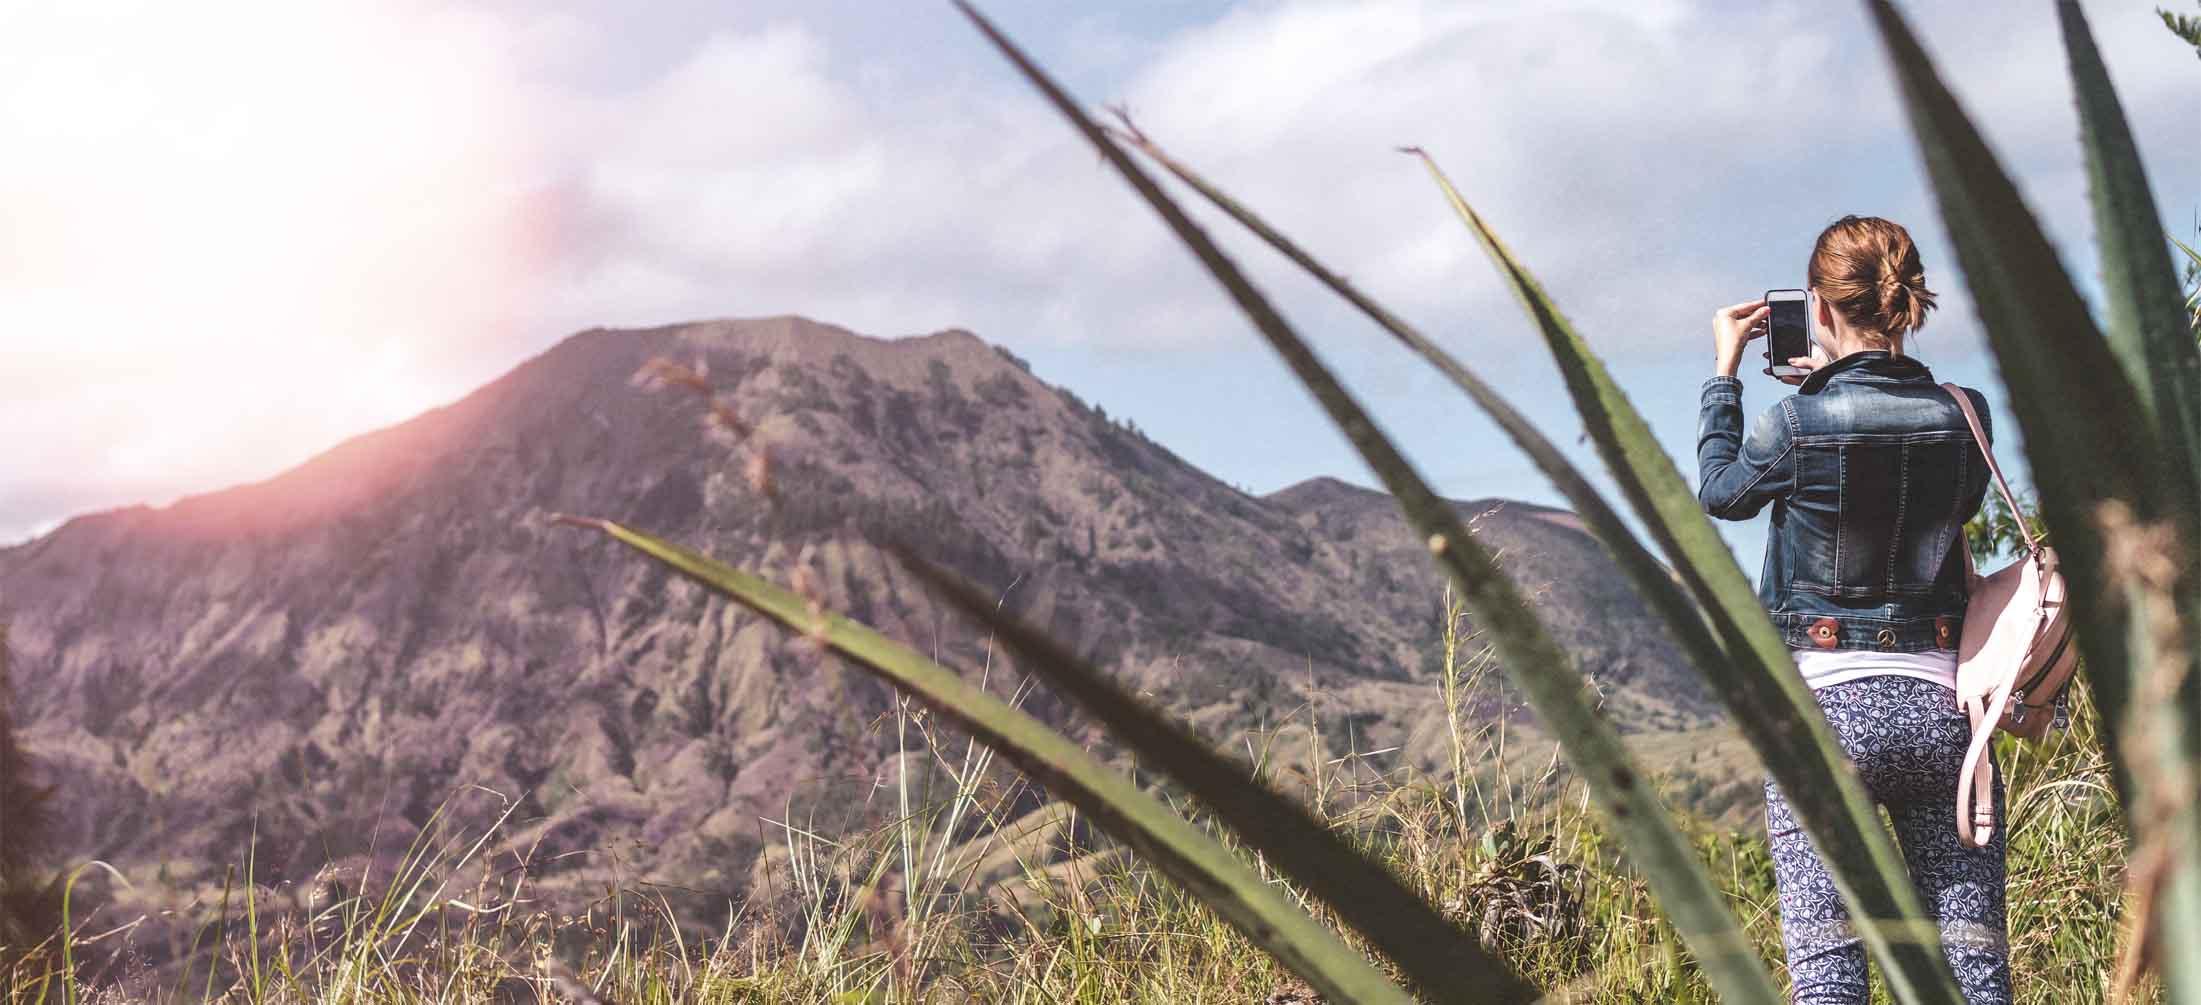 Atop Mt Batur - photo